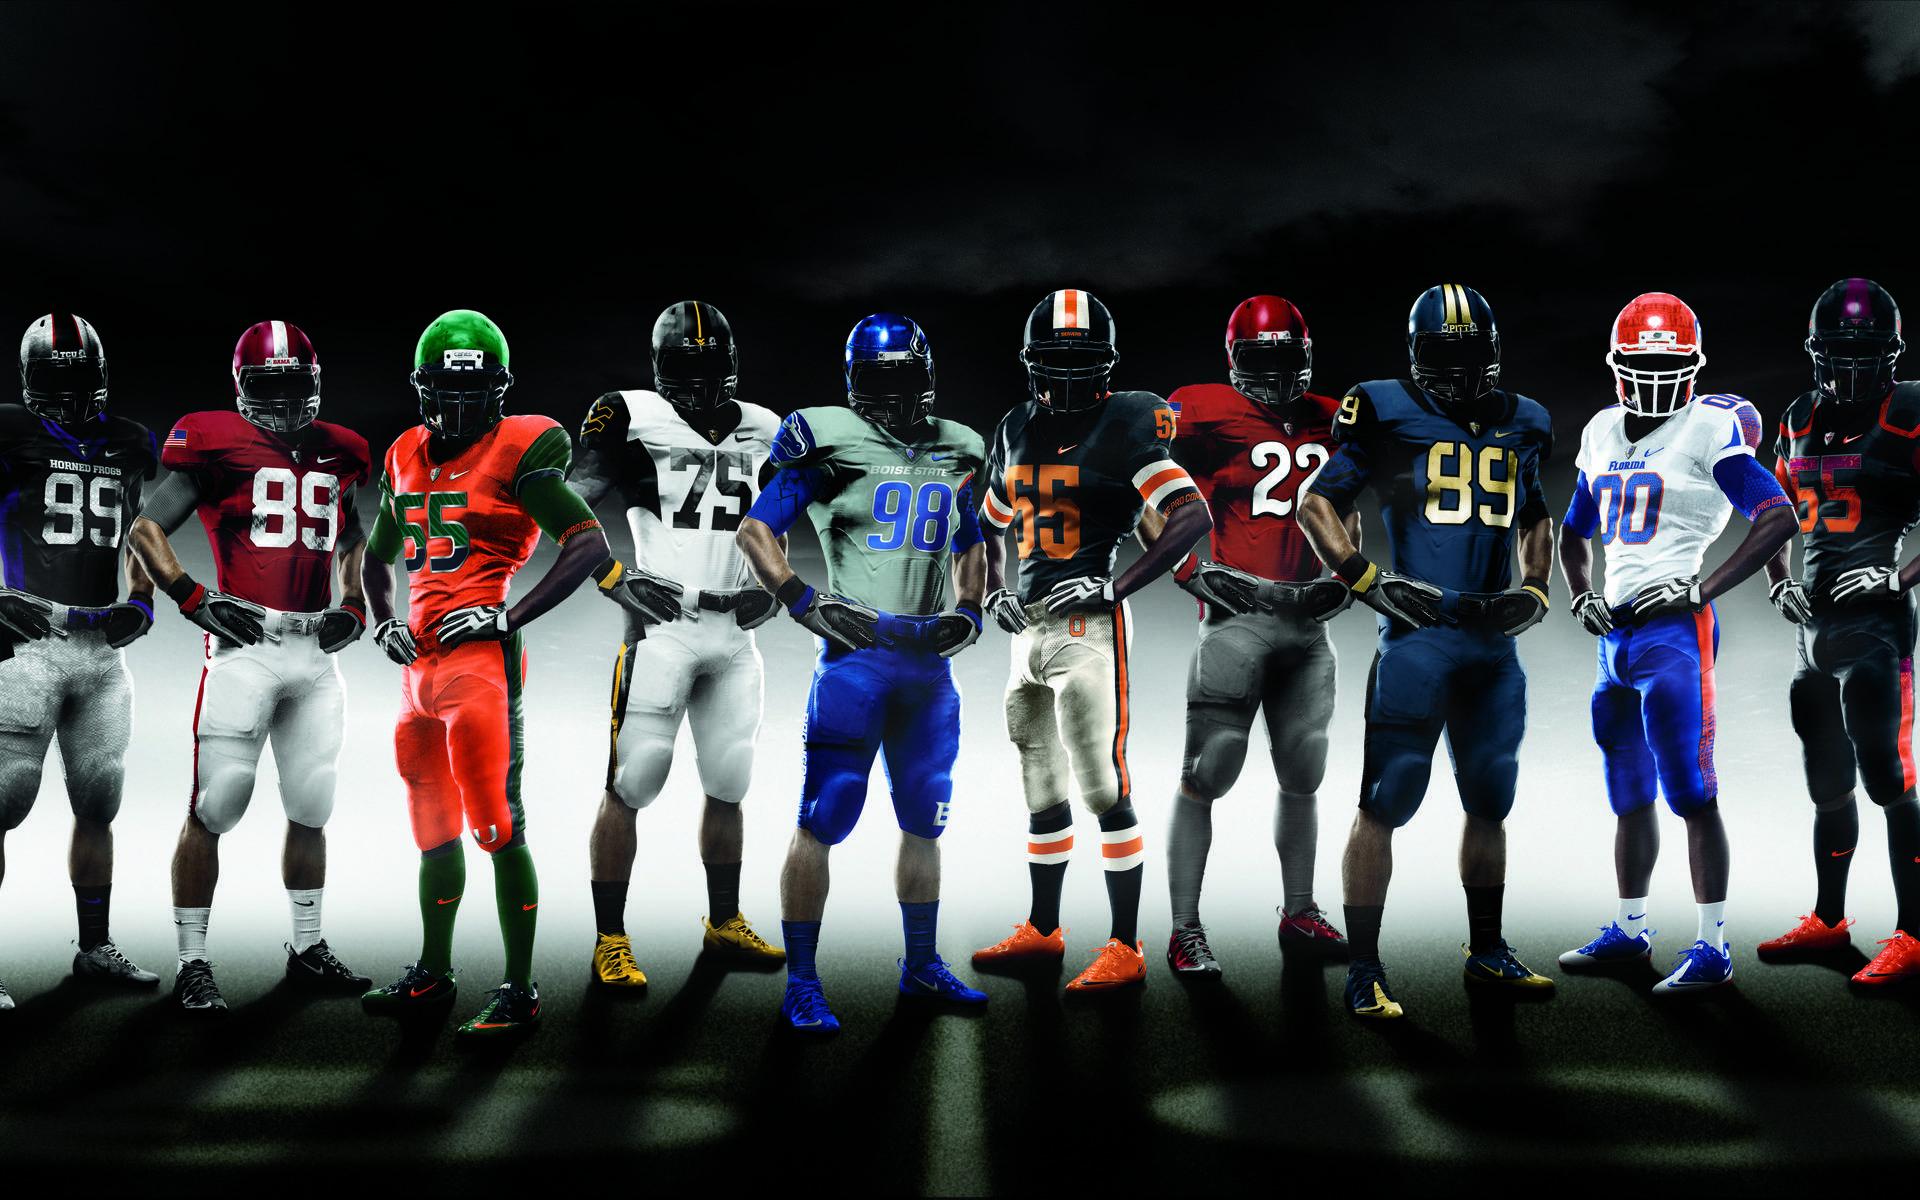 NFL Wallpapers Free Wallpaper